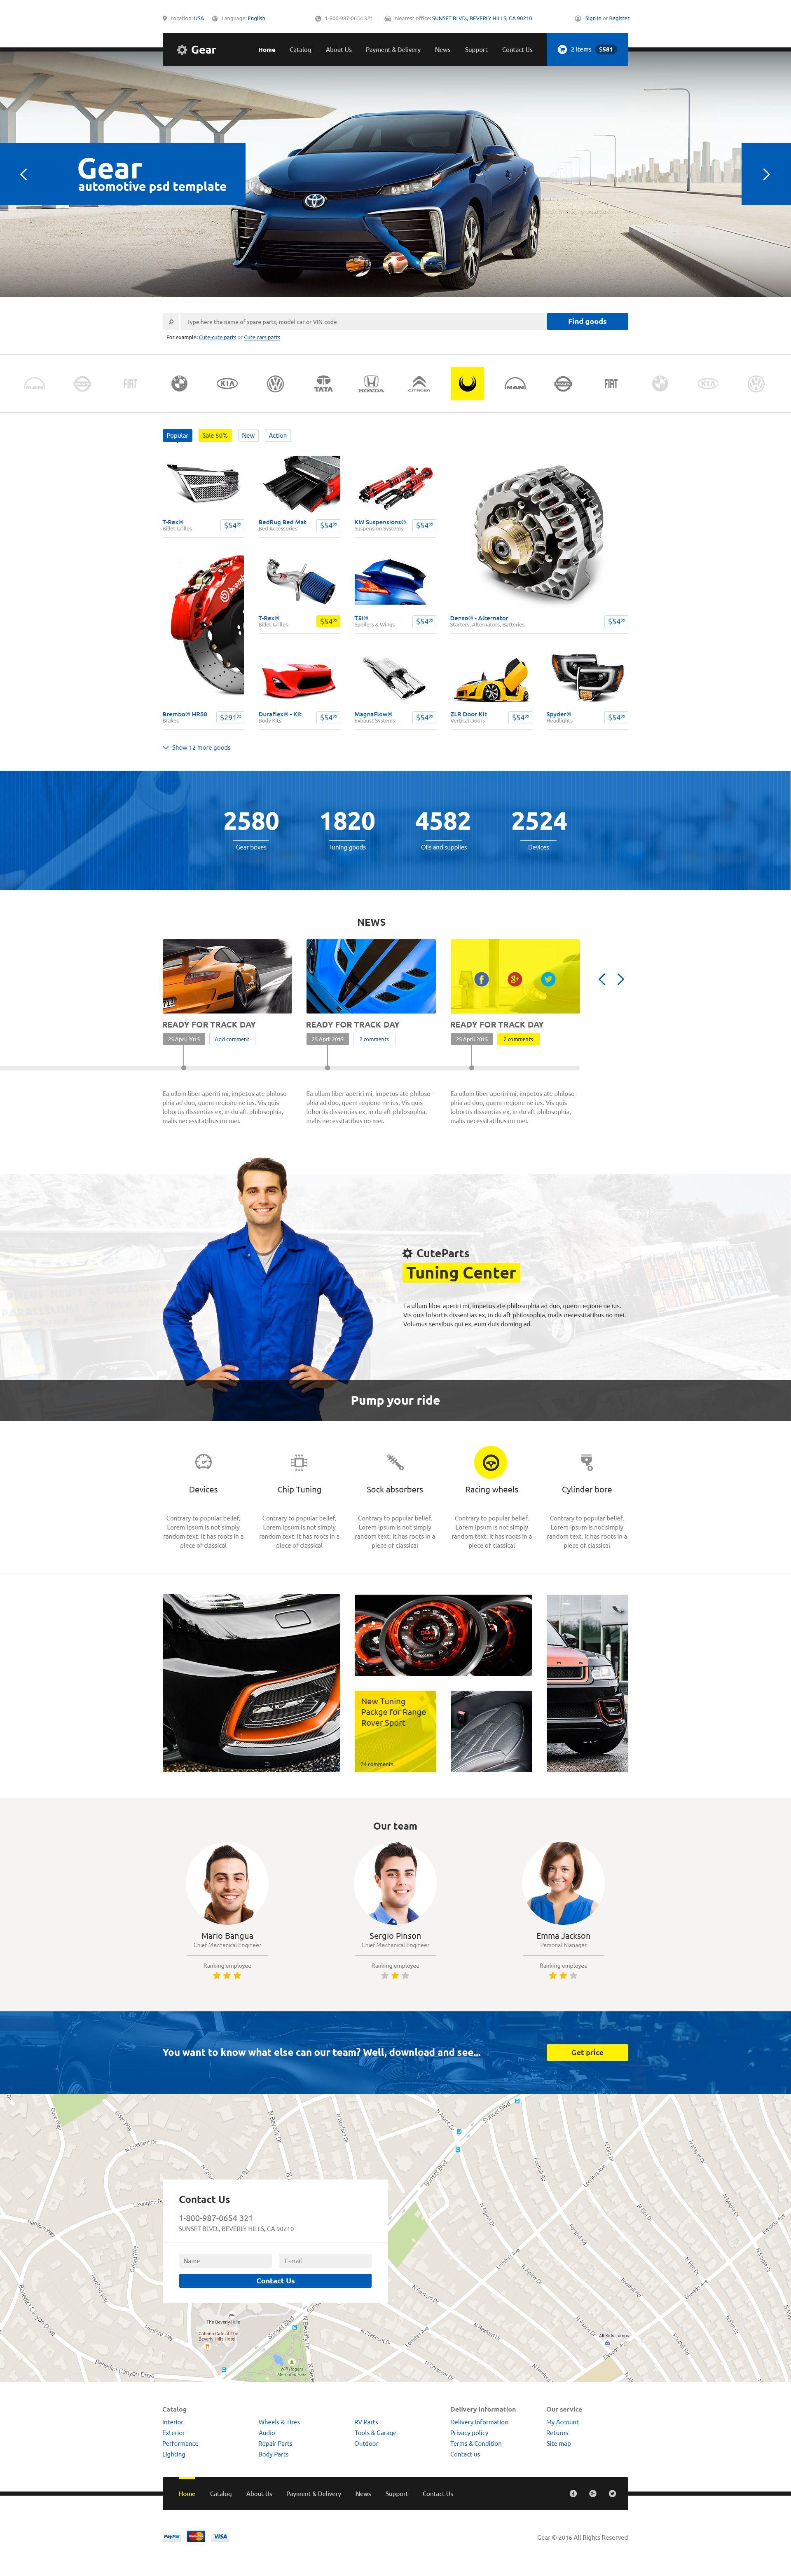 Gear — Automotive Business & Auto Parts Store PSD Template ...